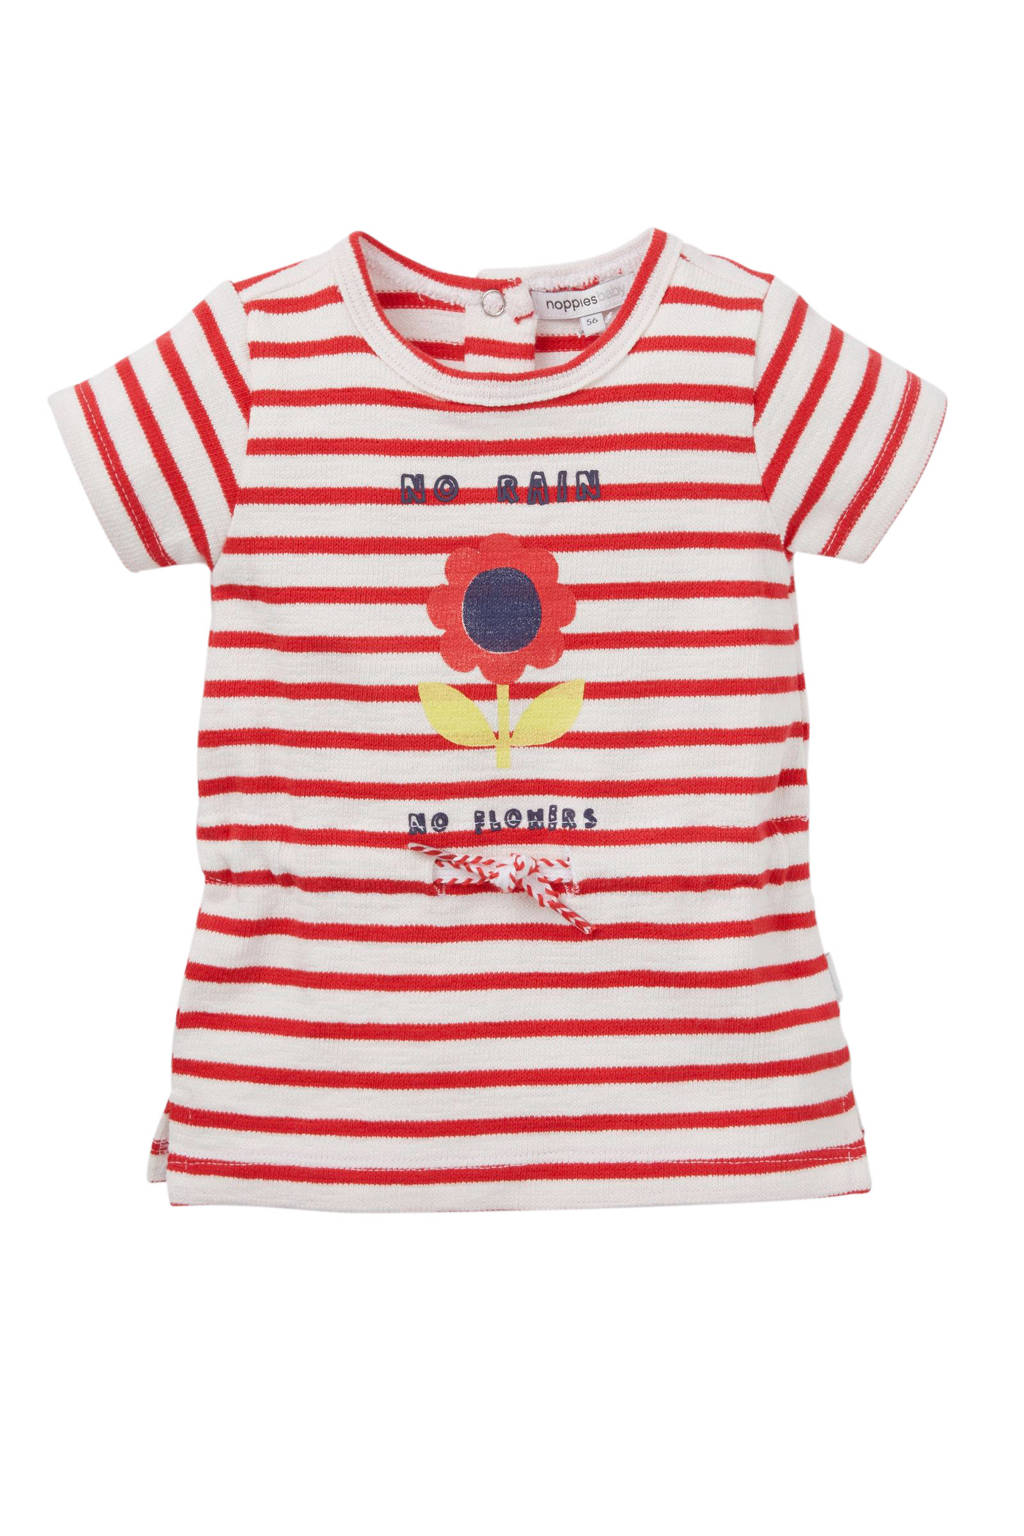 Noppies gestreepte jersey jurk rood/wit, Rood/wit